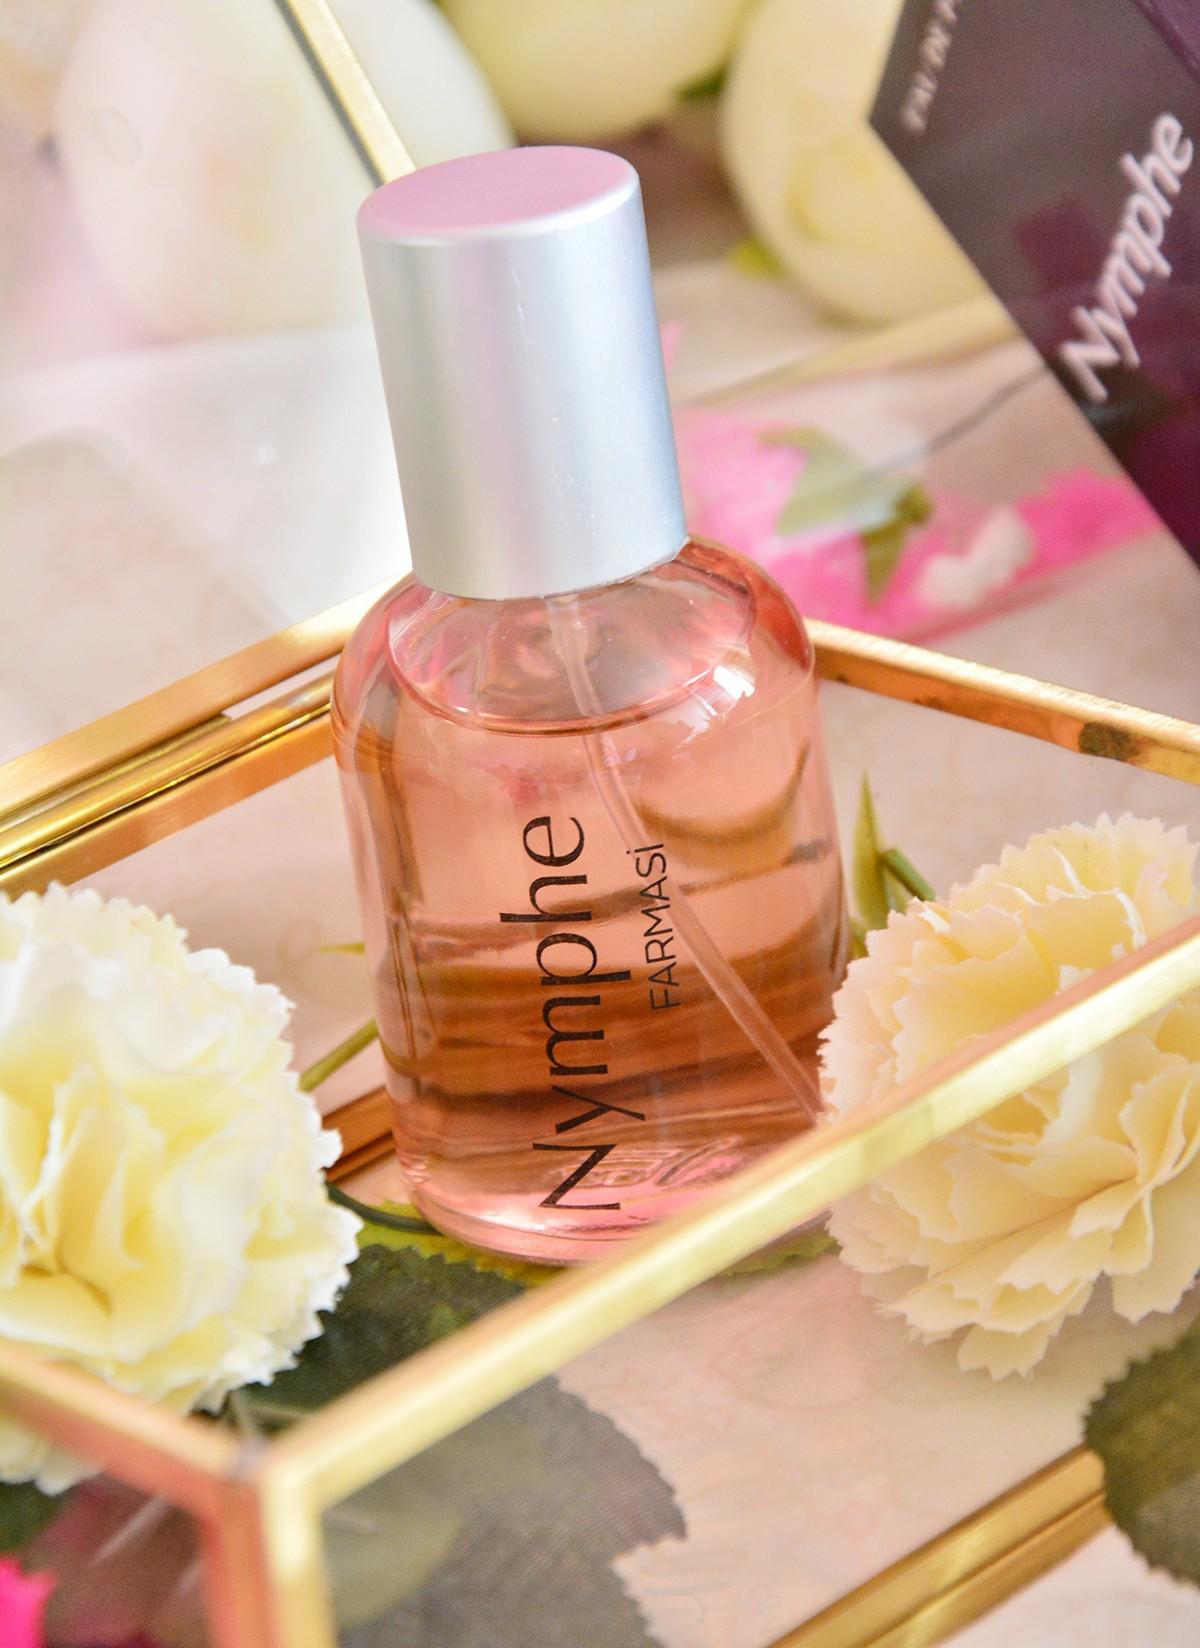 Farmasi Nymphe Parfüm Kullananlar